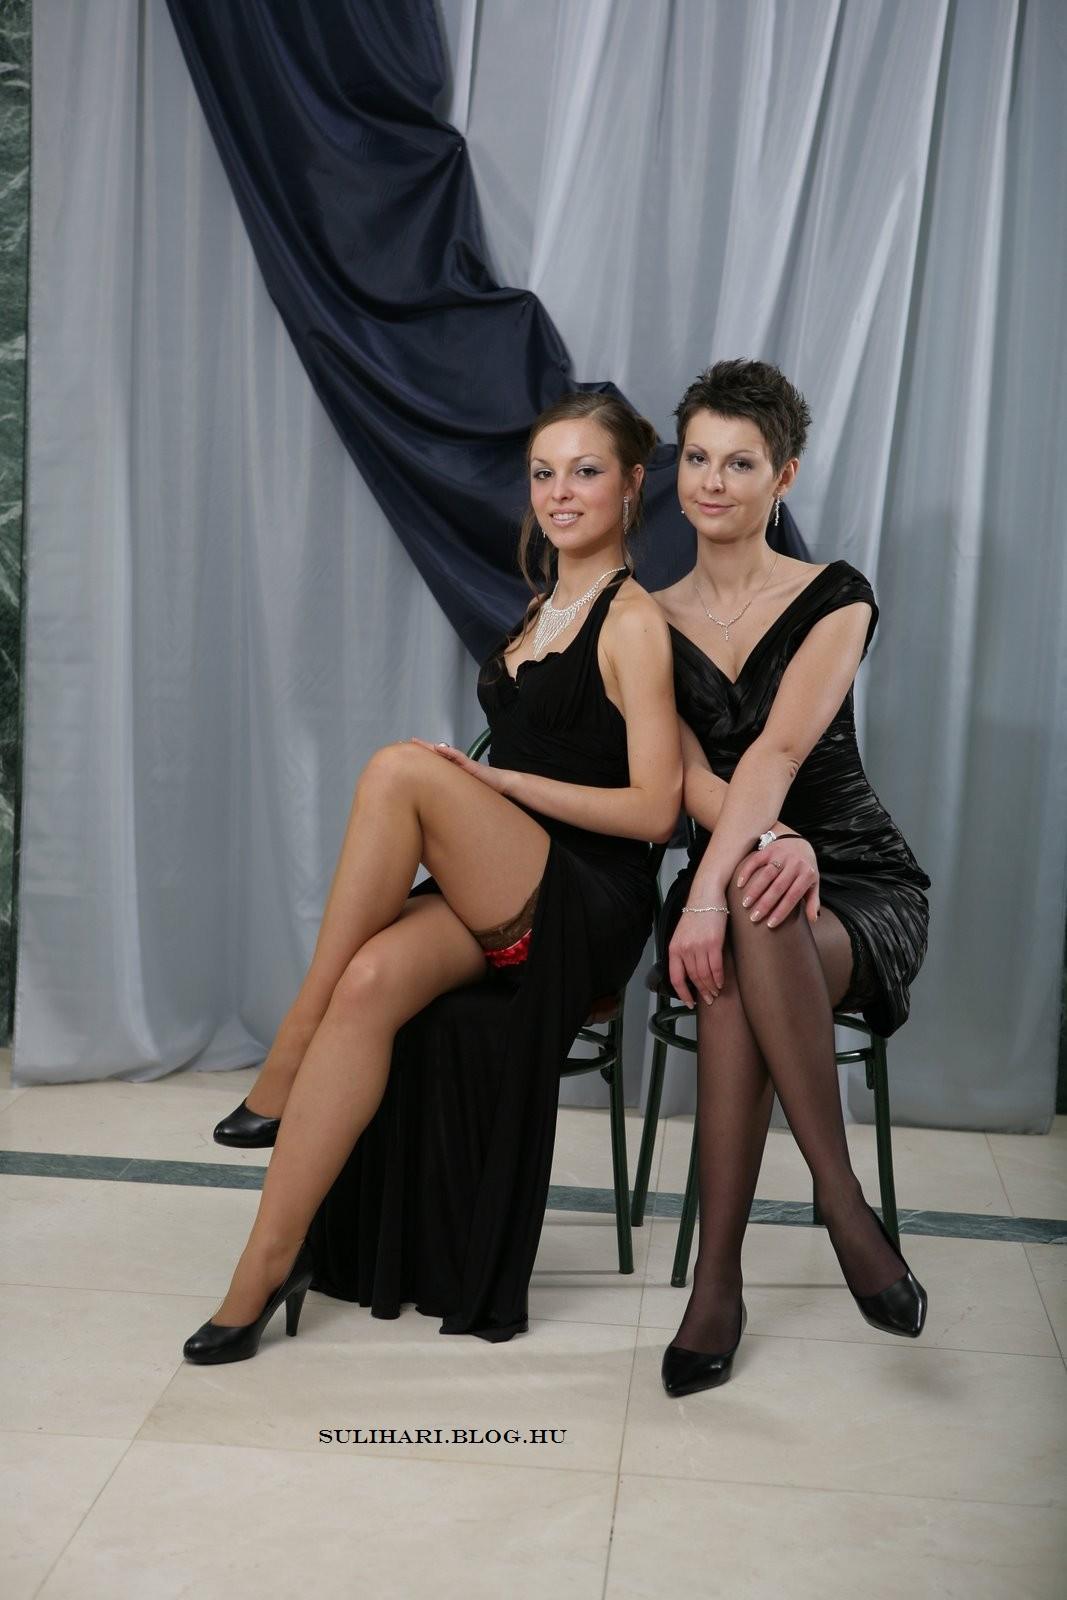 Girls Posing In Evening Dress Sitting Ii | Free HD Wallpapers